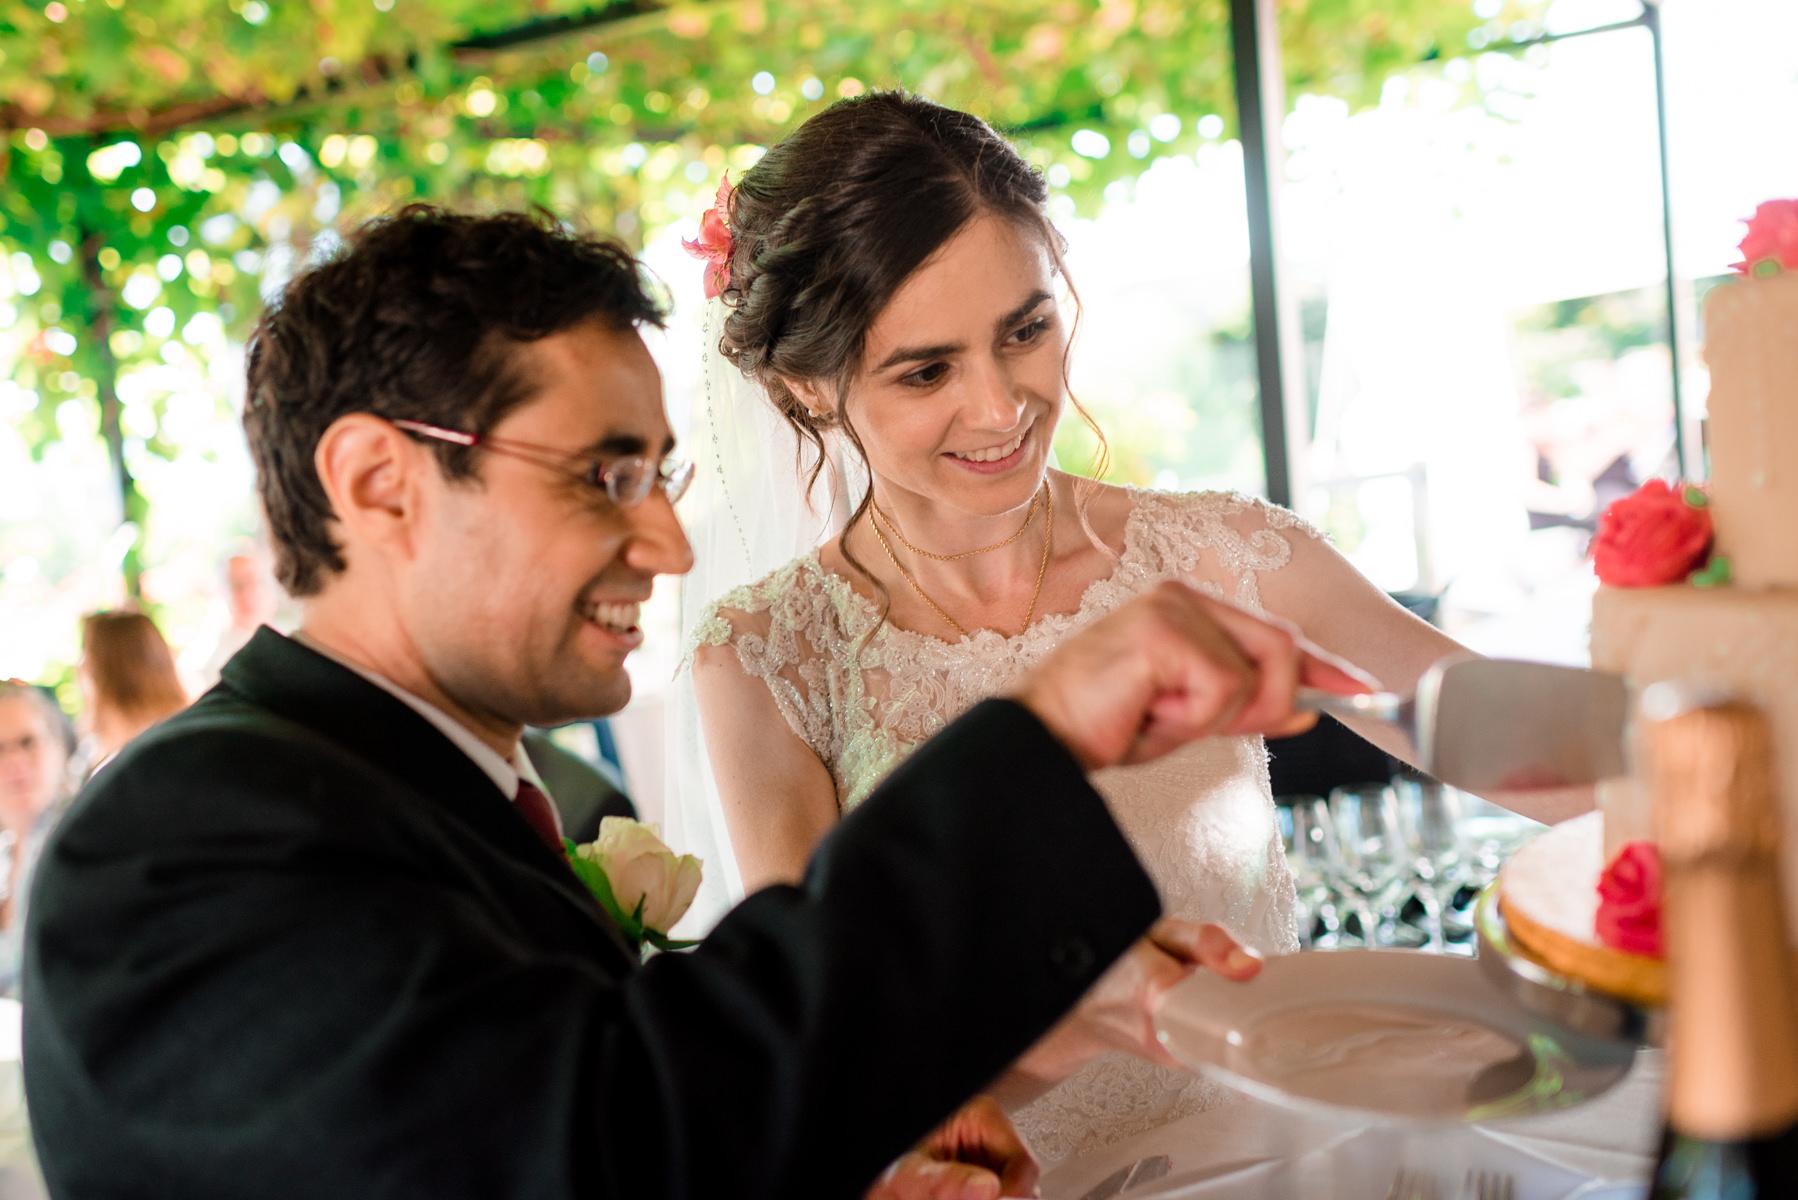 Andrew Tat - Documentary Wedding Photography - Kirkland, Washington - Emily & Cuauh - 33.JPG